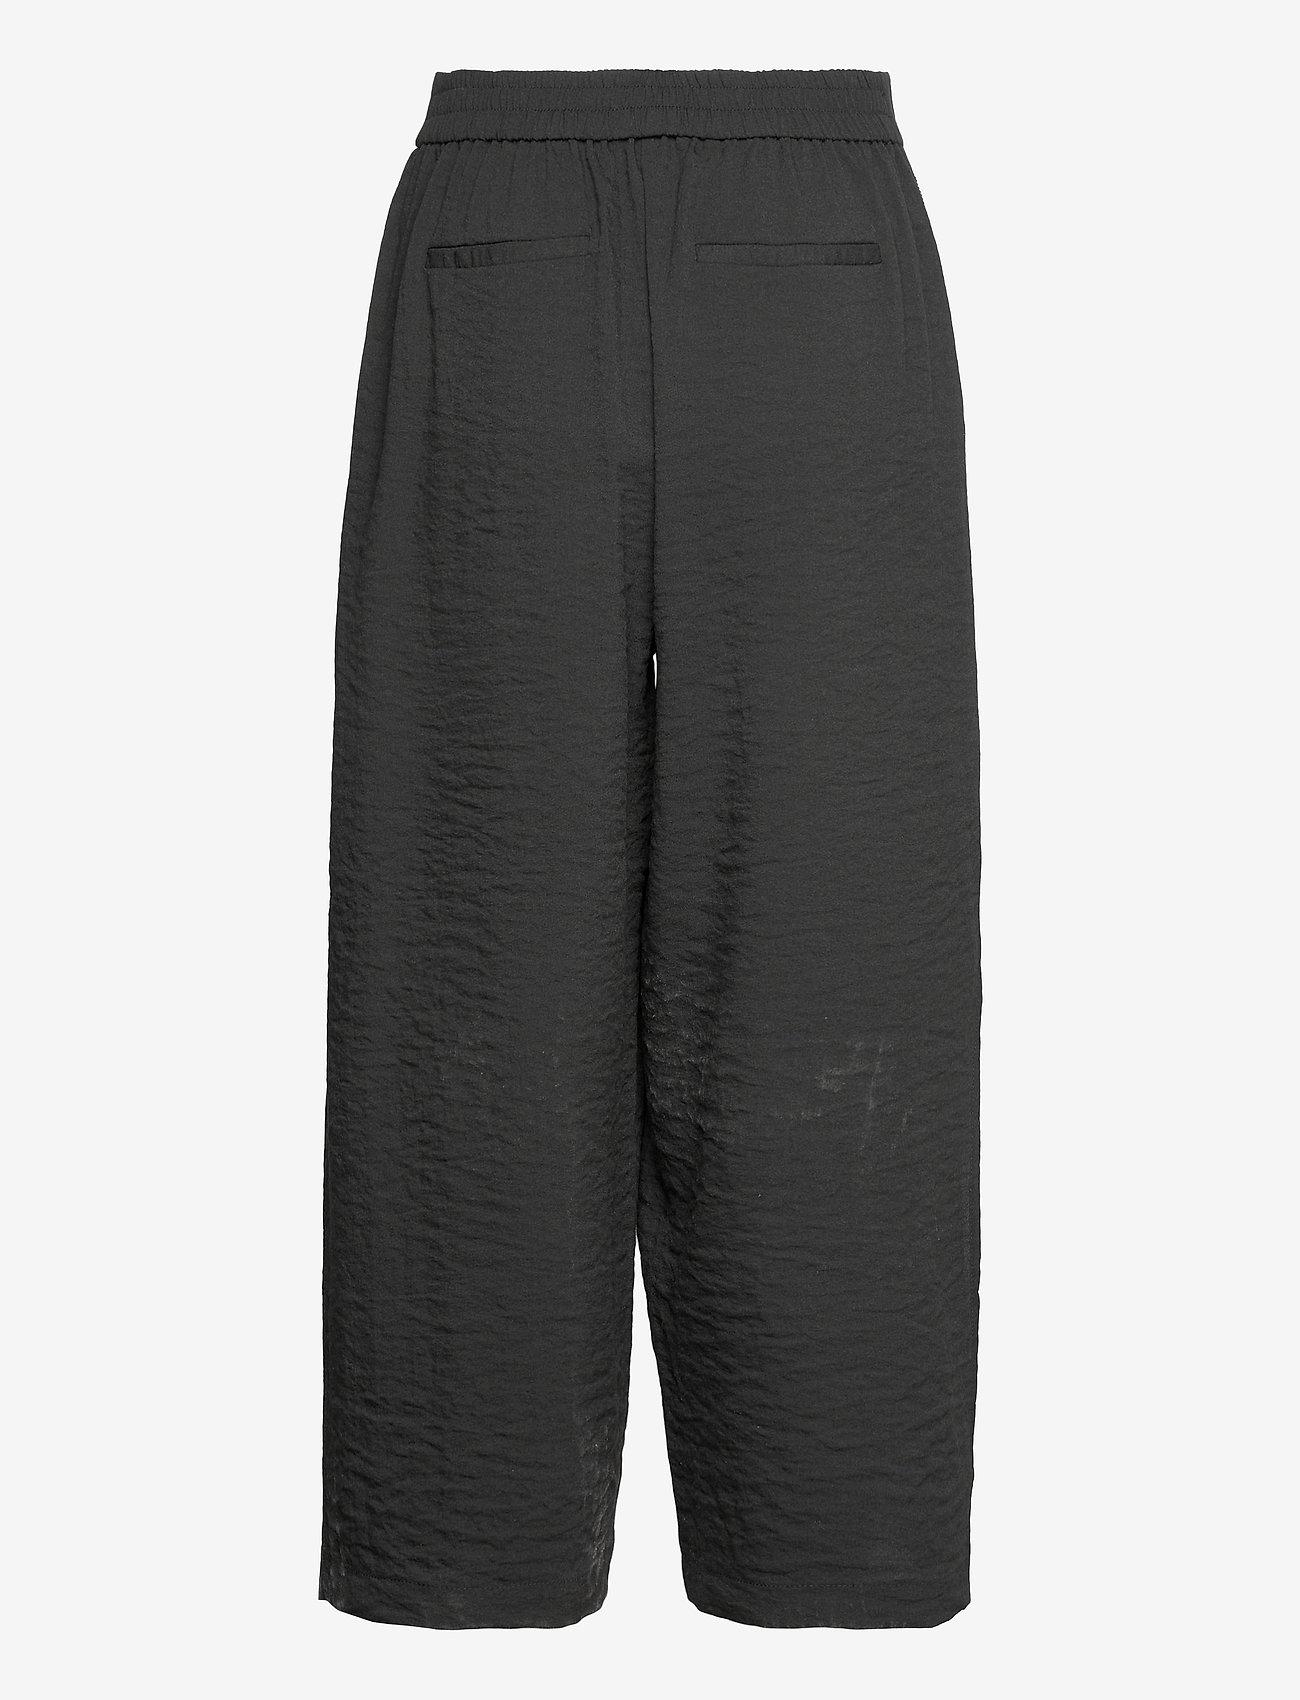 Vila - VILINEA RW 7/8 PANTS/2 - bukser med brede ben - black - 1